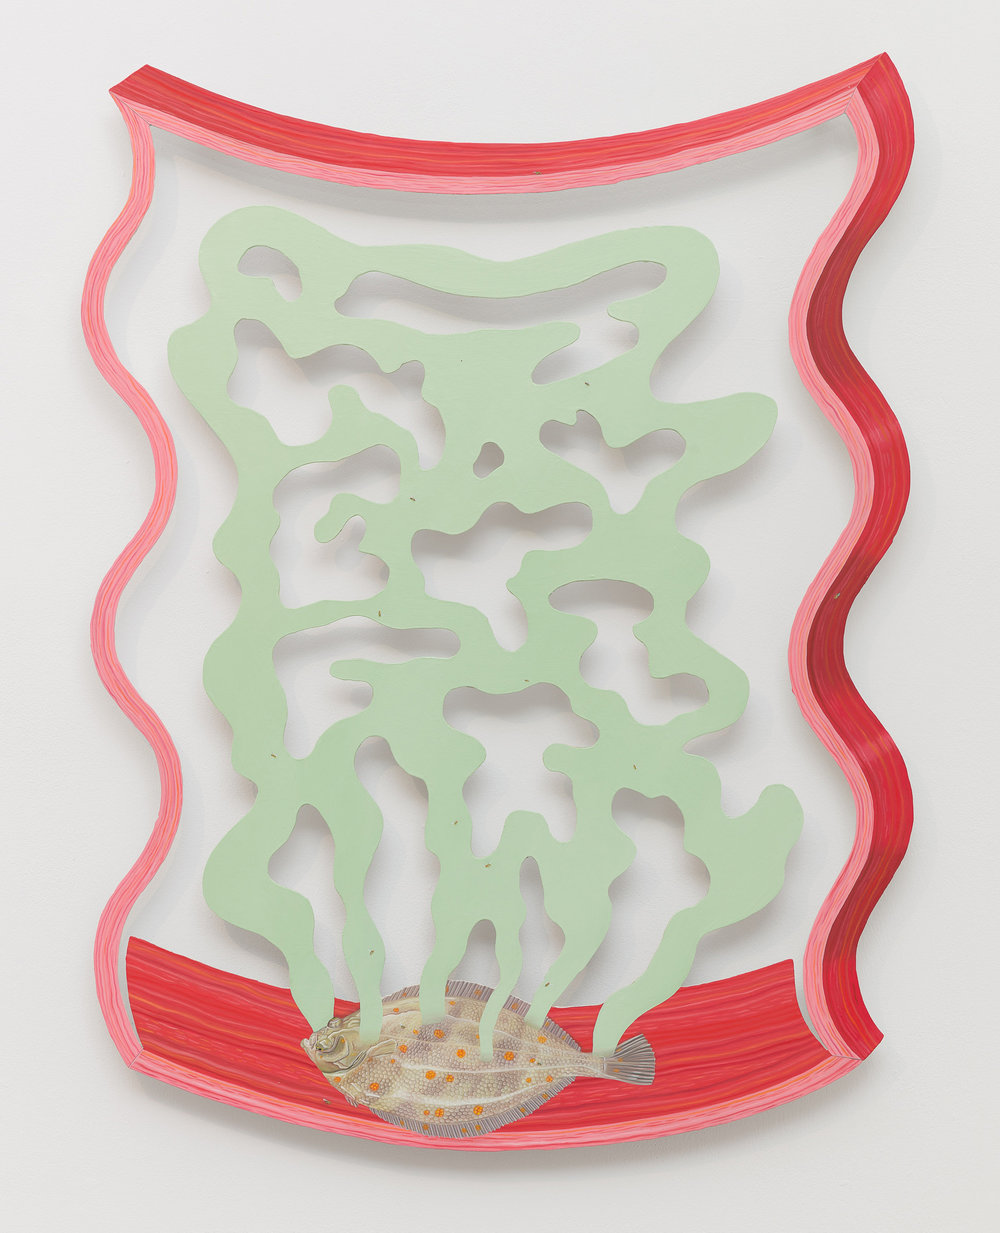 Tristan Pigott  Ceaselessly Streaming , 2018 Oil on aluminium 72 x 55.4 cm